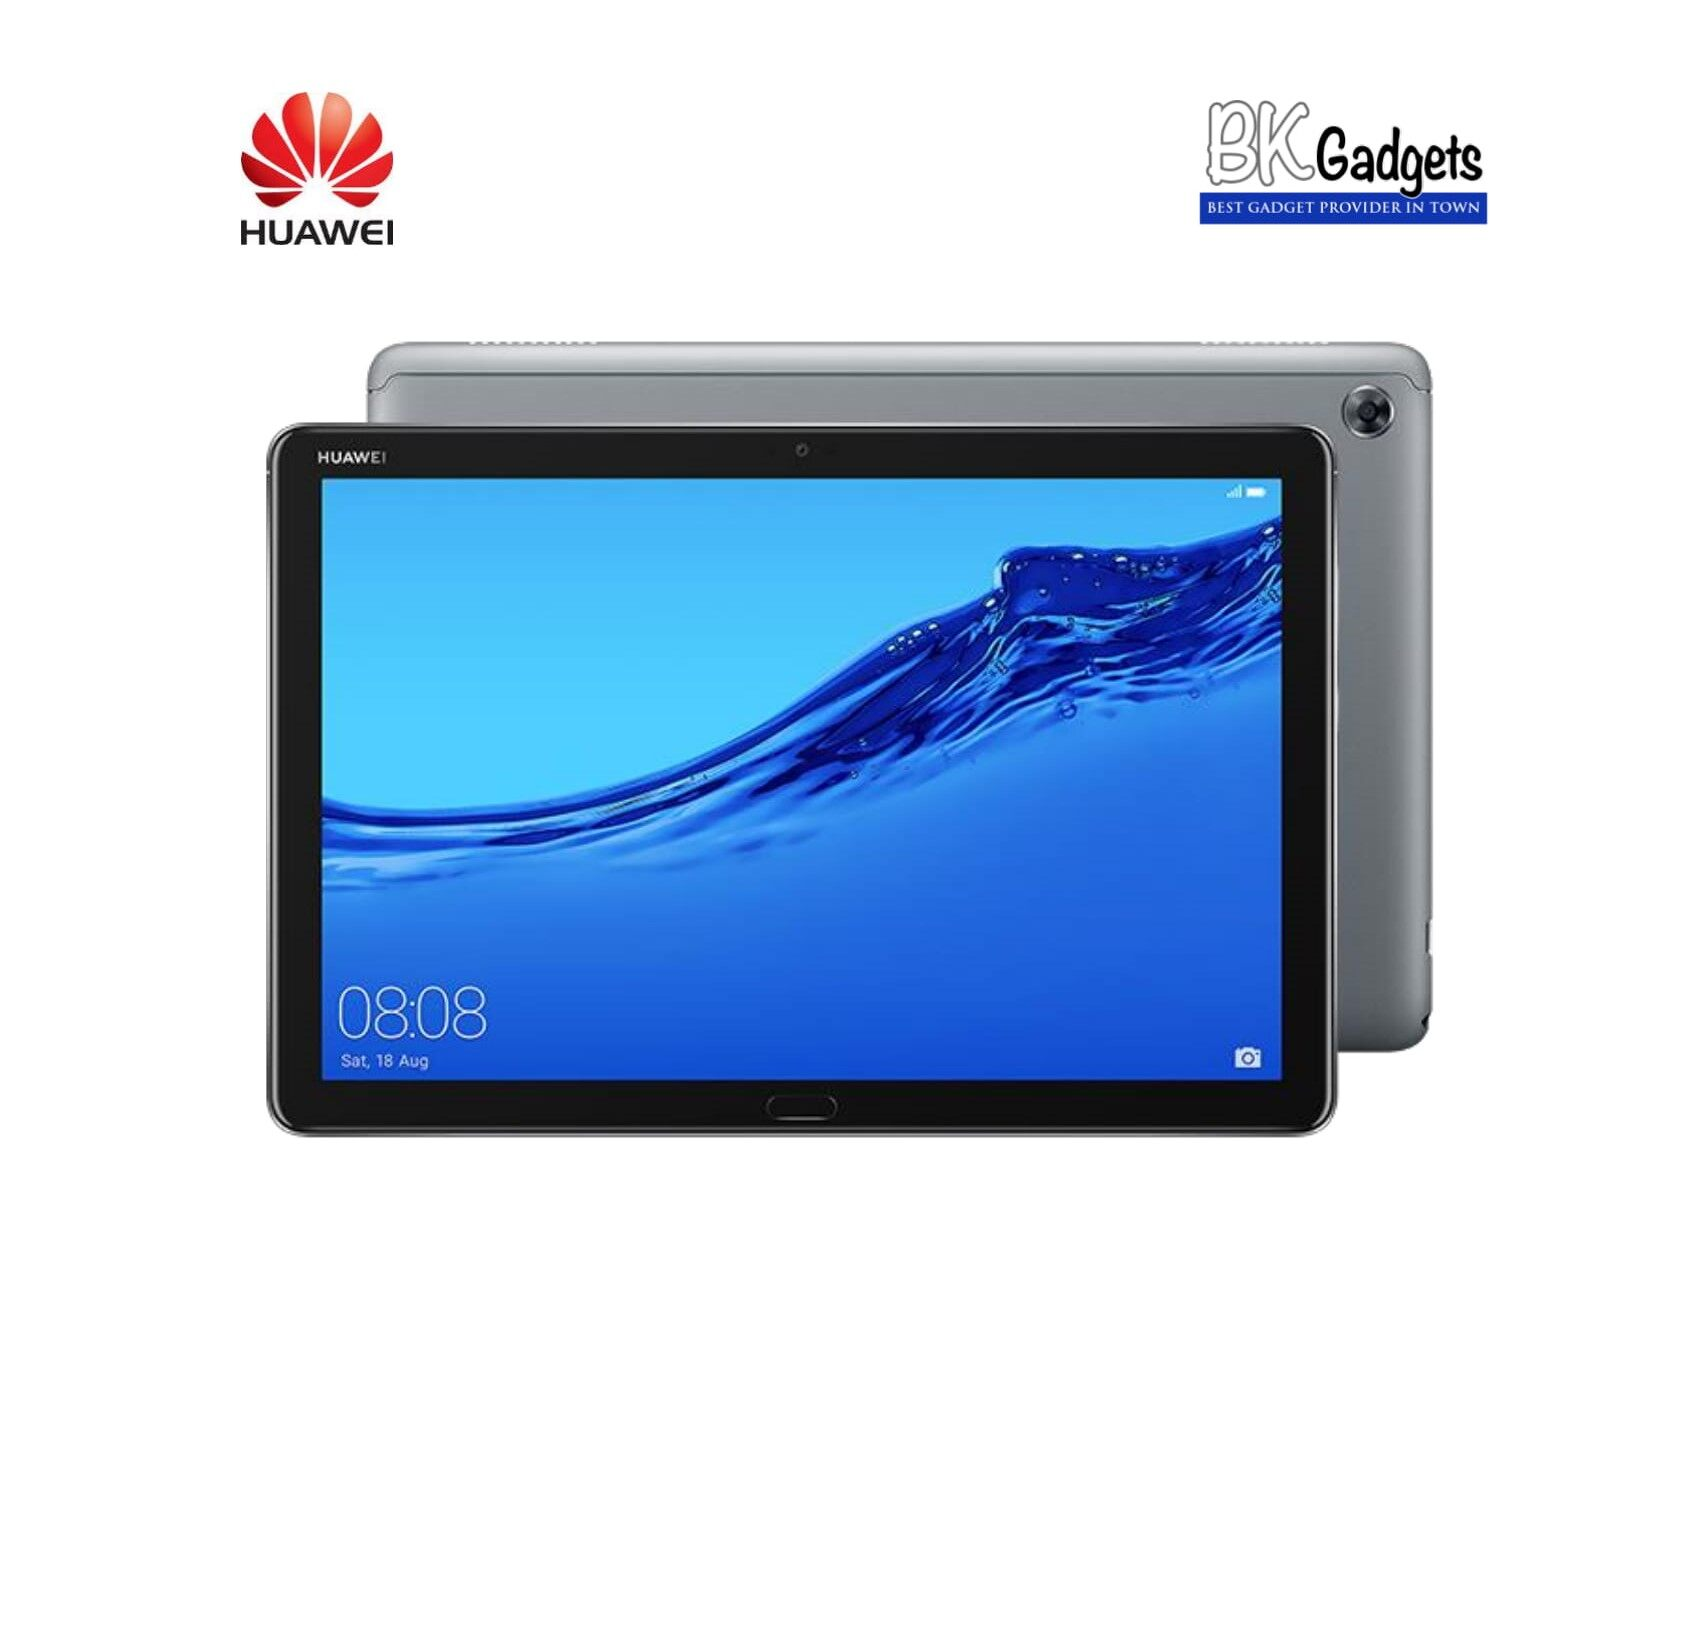 HUAWEI M5 Lite Space Grey [ 3GB+32GB ] Tablet + FREE M-Pen